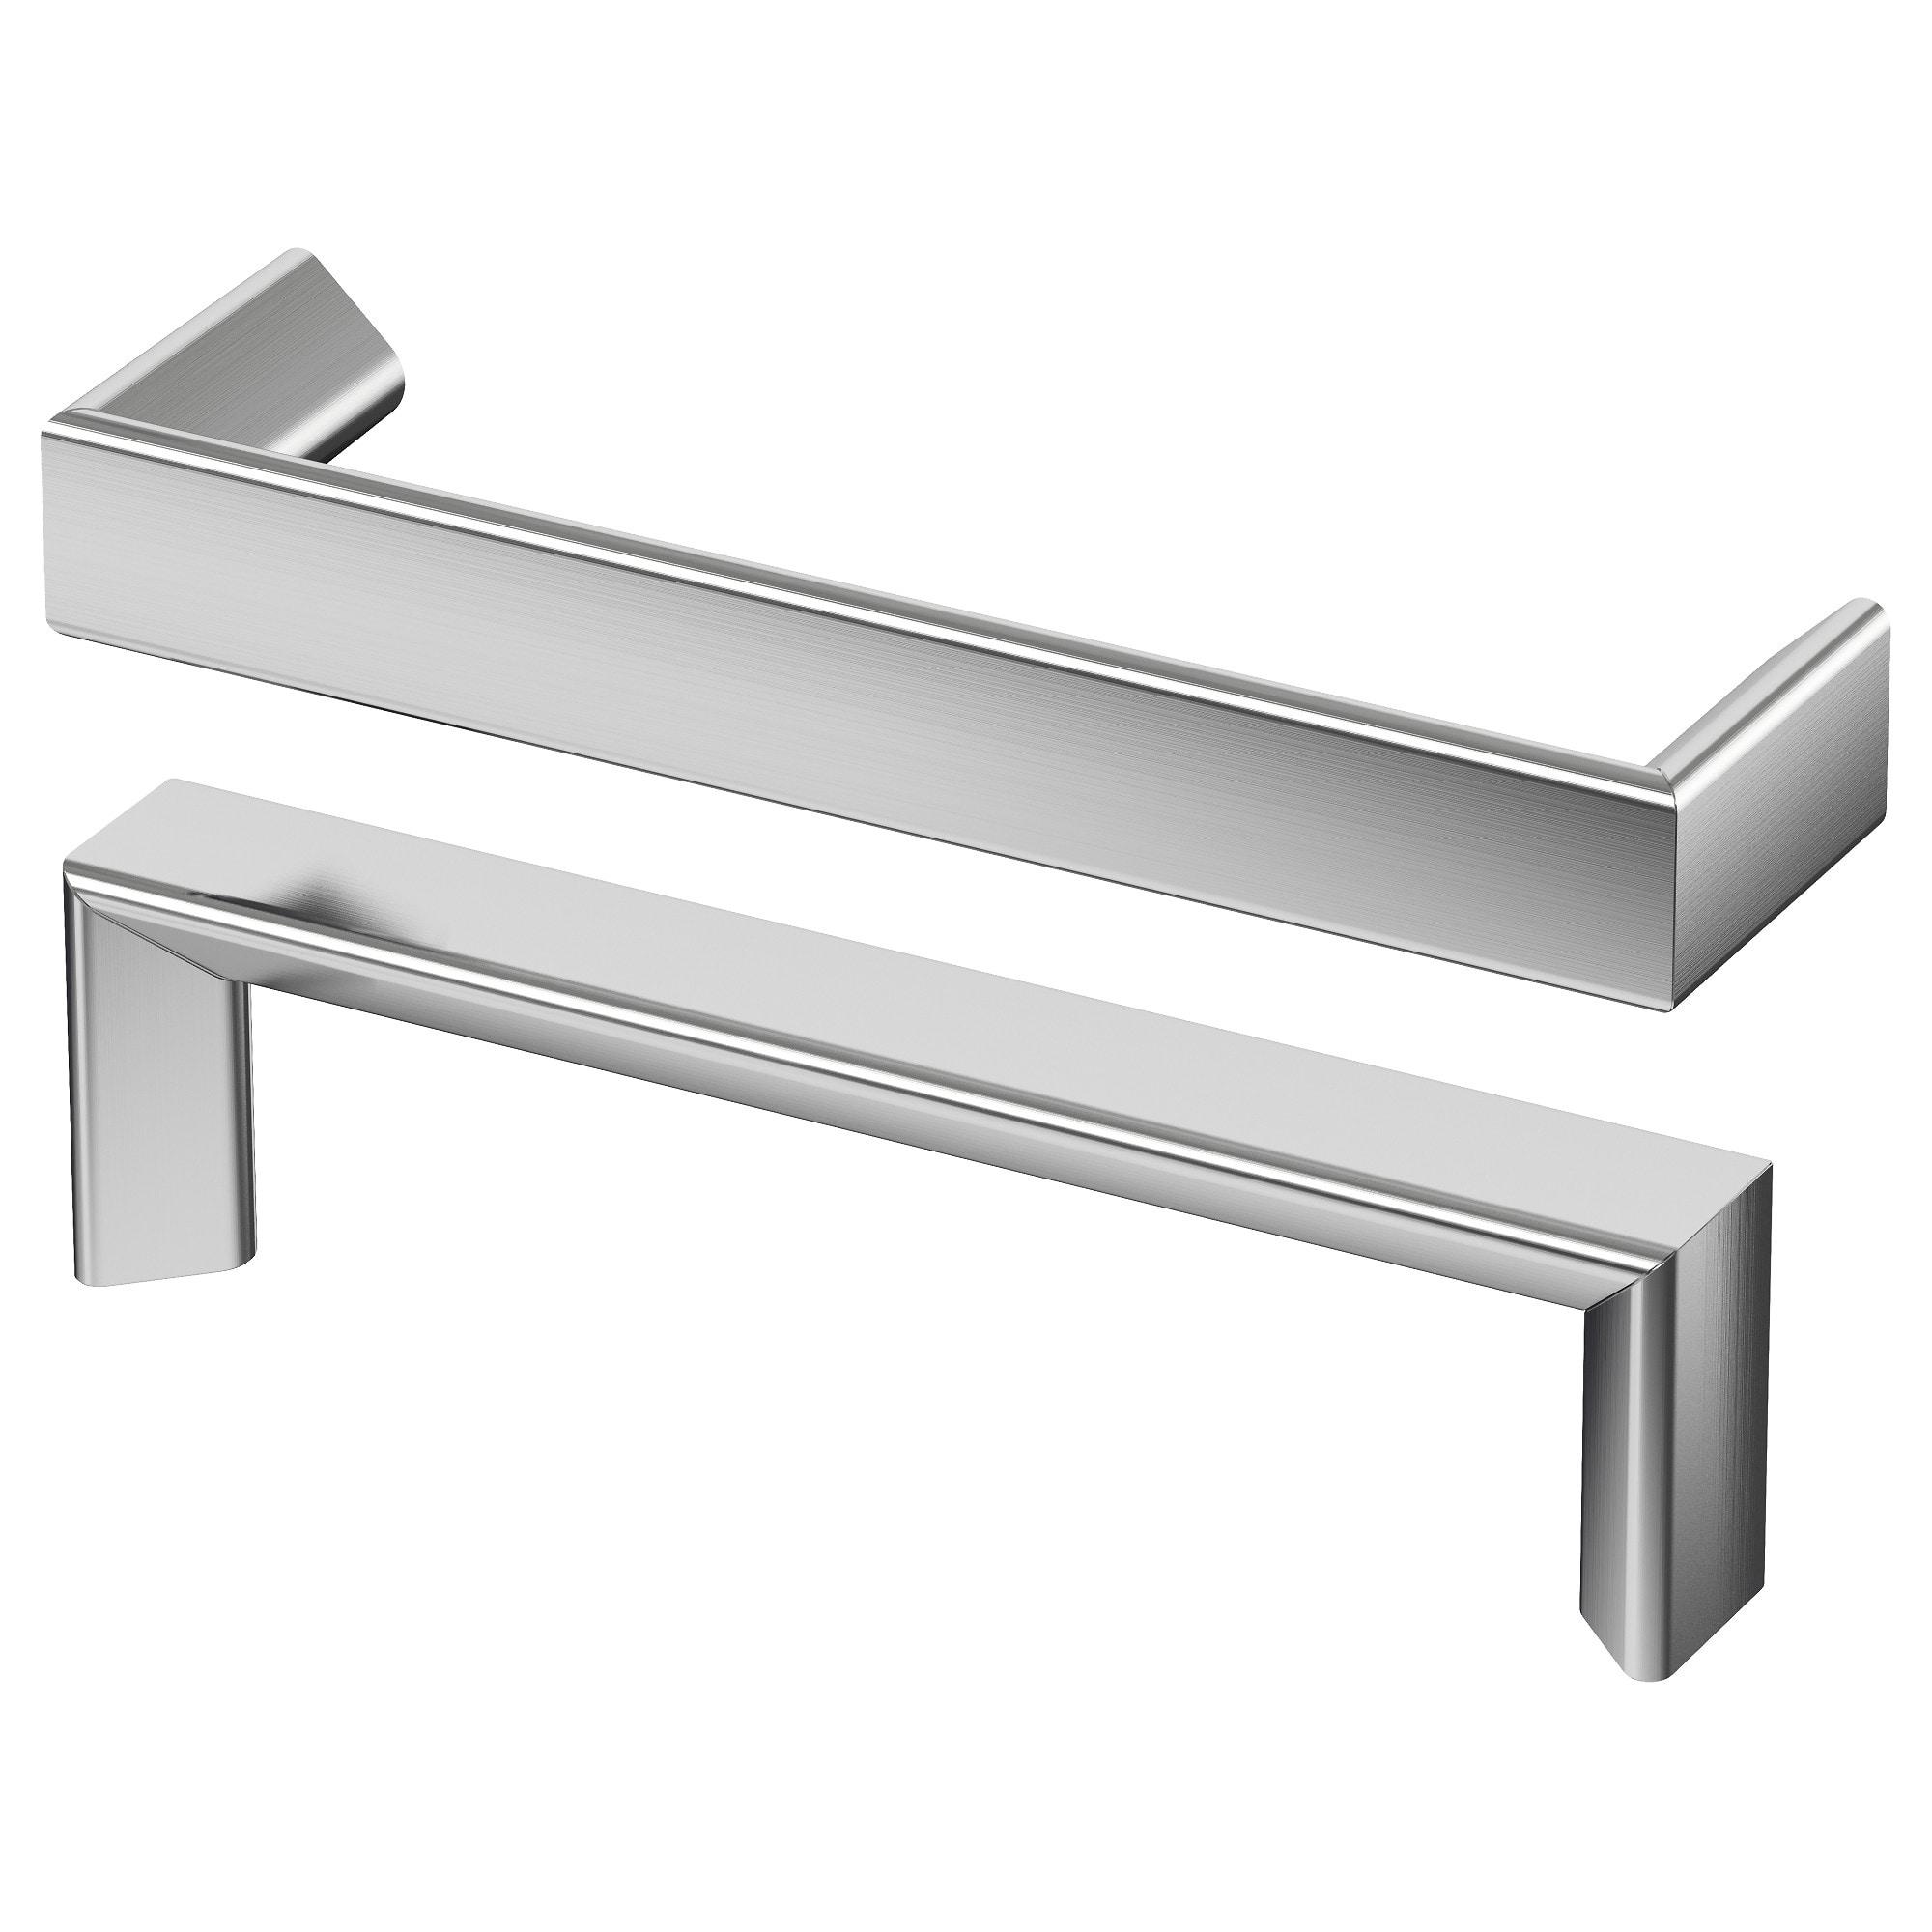 IKEA TYDA Cupboard Handle stainless steel 138 mm